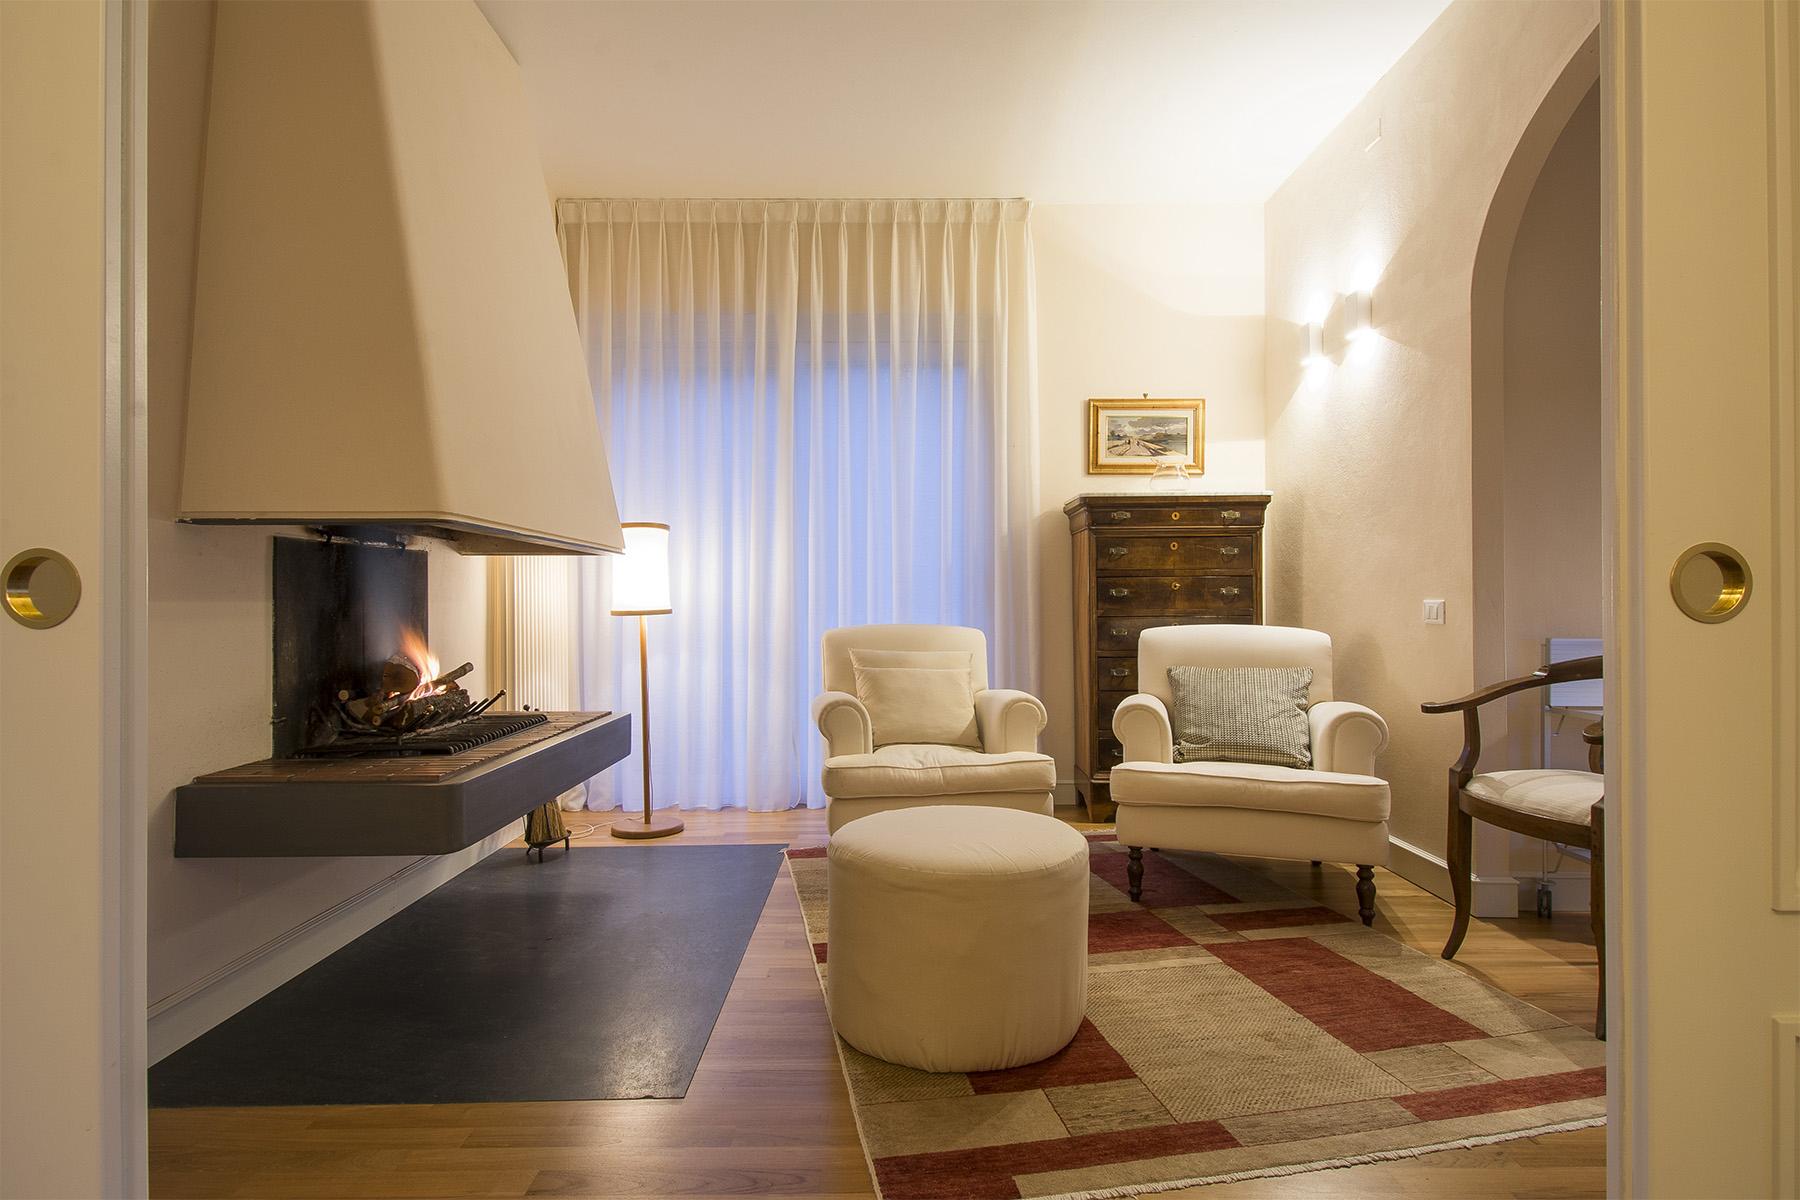 Villa in Vendita a Lucca: 5 locali, 470 mq - Foto 10